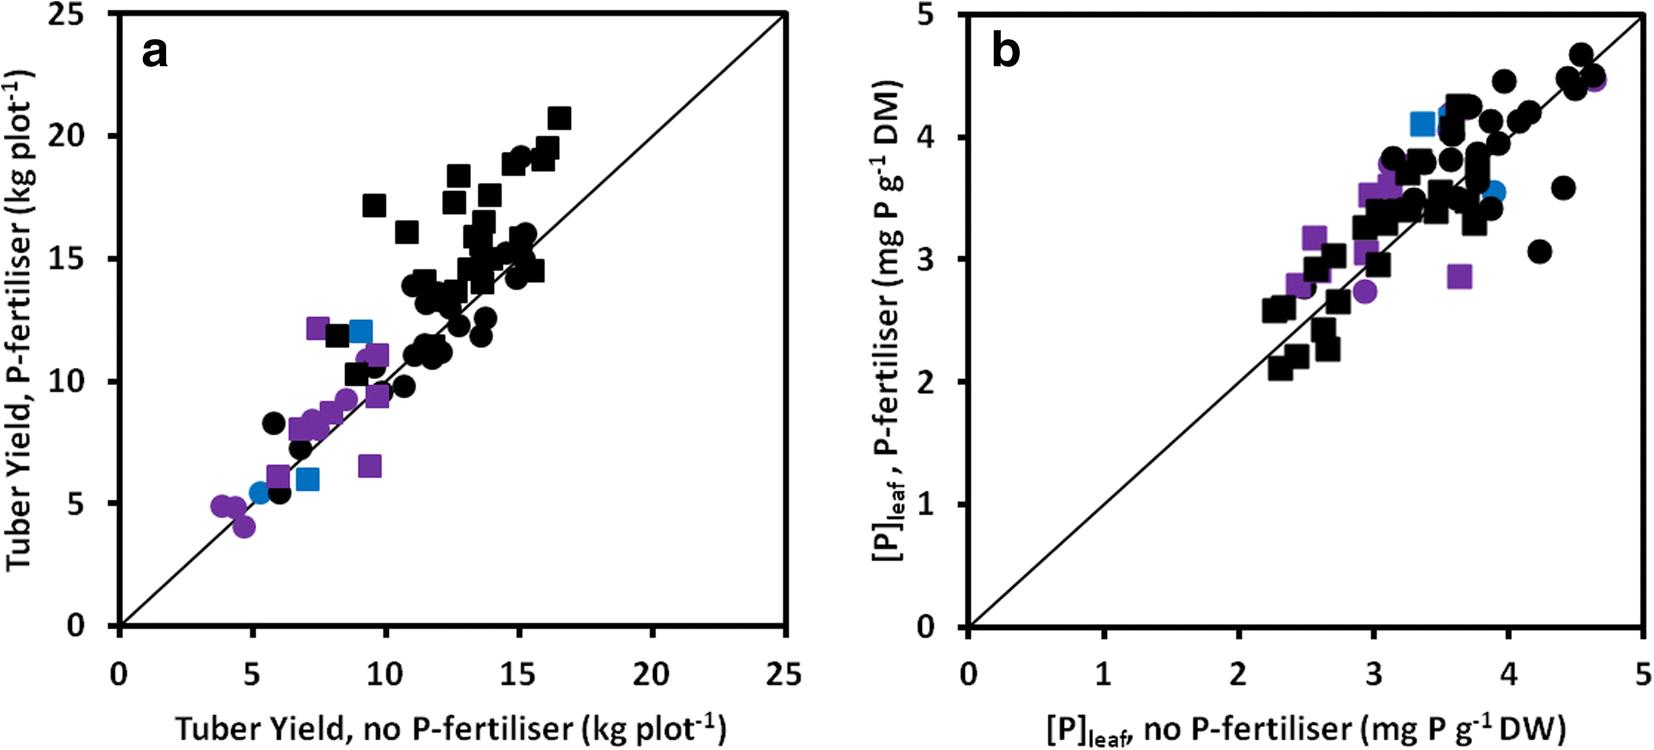 11104_2018_3776_Fig1_HTML juvenile root vigour improves phosphorus use efficiency of potato